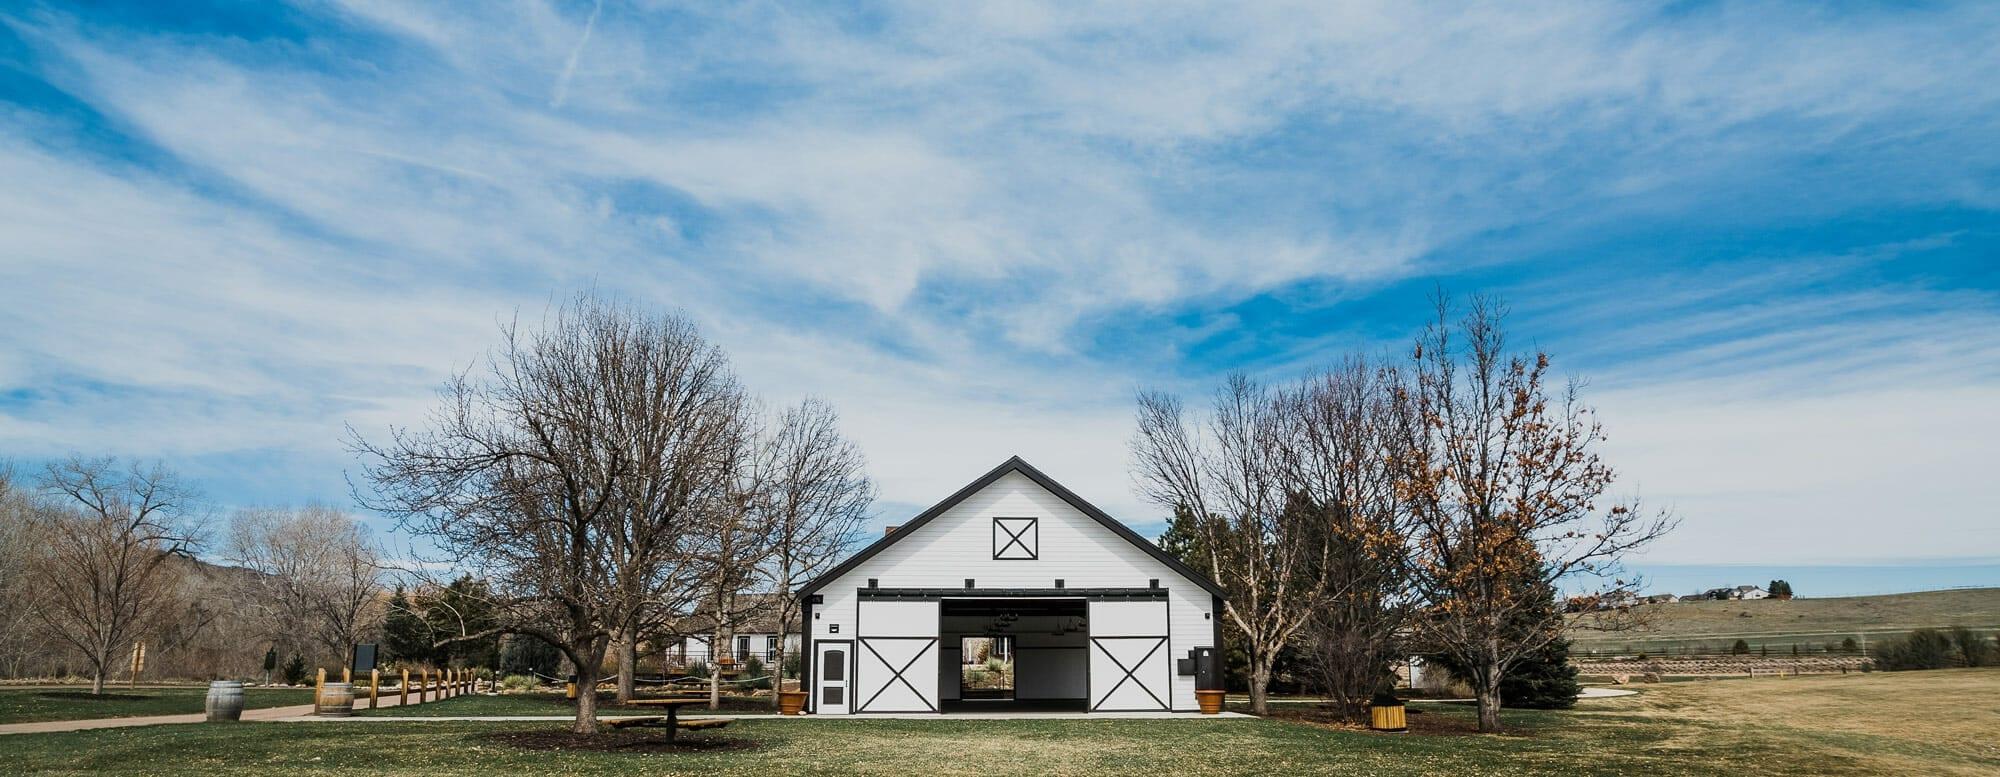 Denver Botanic Gardens Chatfield Farms Virtual Tour - Deer Creek Stables